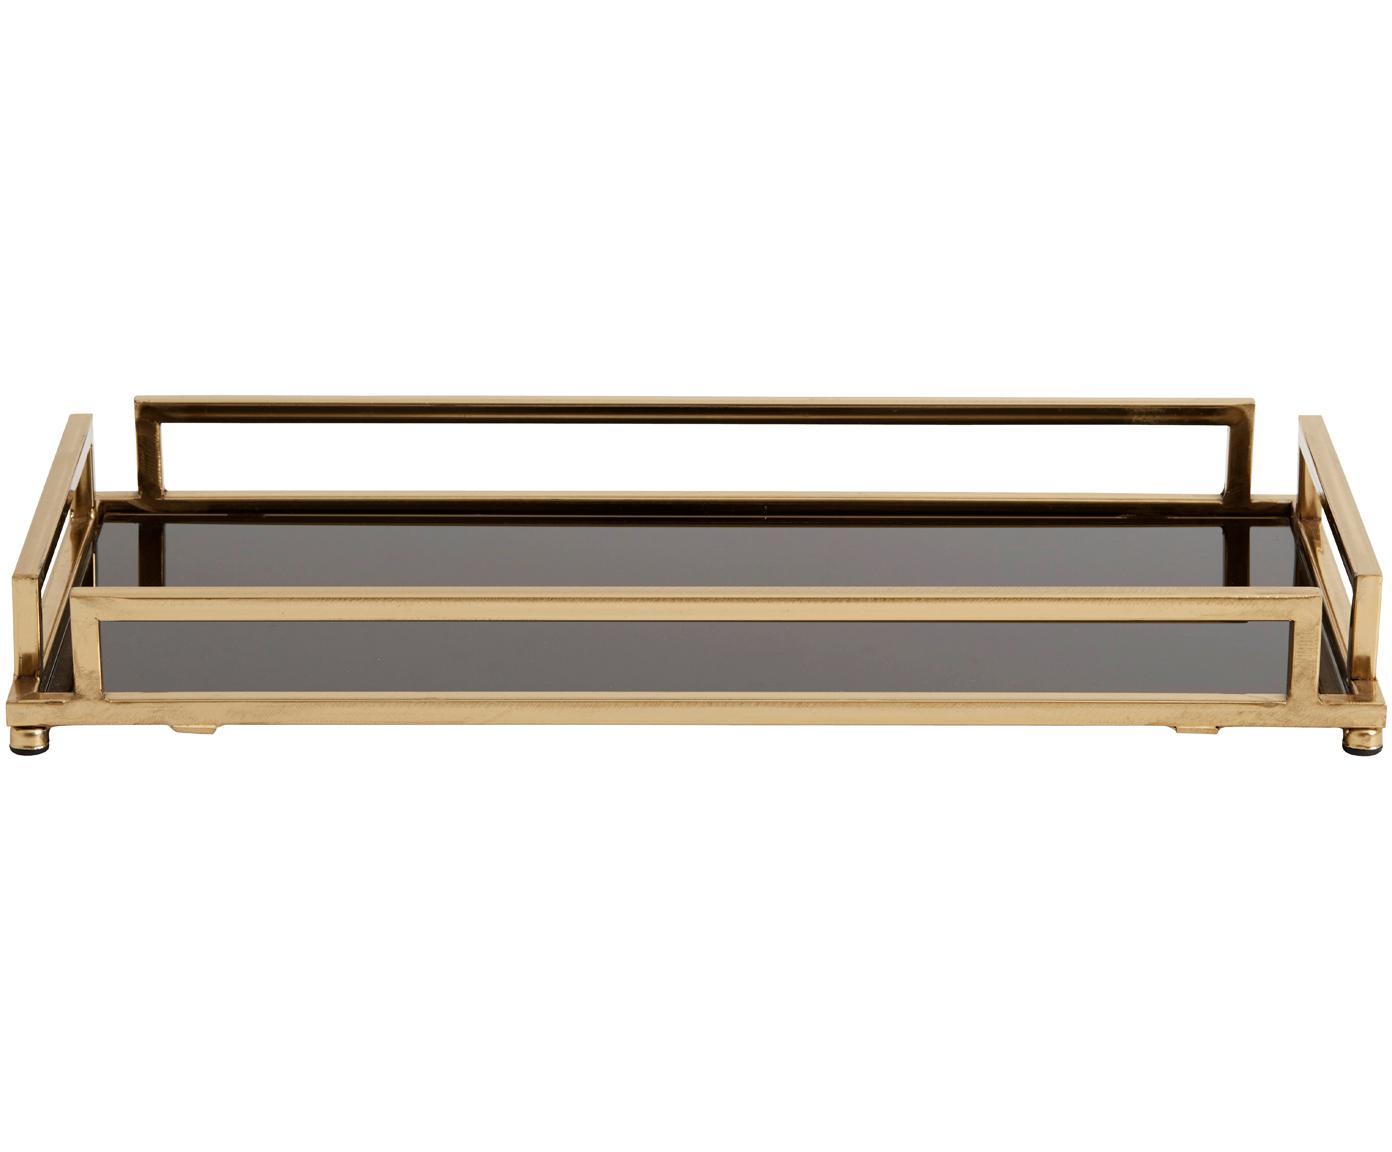 Decoratief dienblad Traika goudkleurig met zwarte plank, Frame: gecoat metaal, Plank: glas, Messingkleurig, zwart, 50 x 6 cm